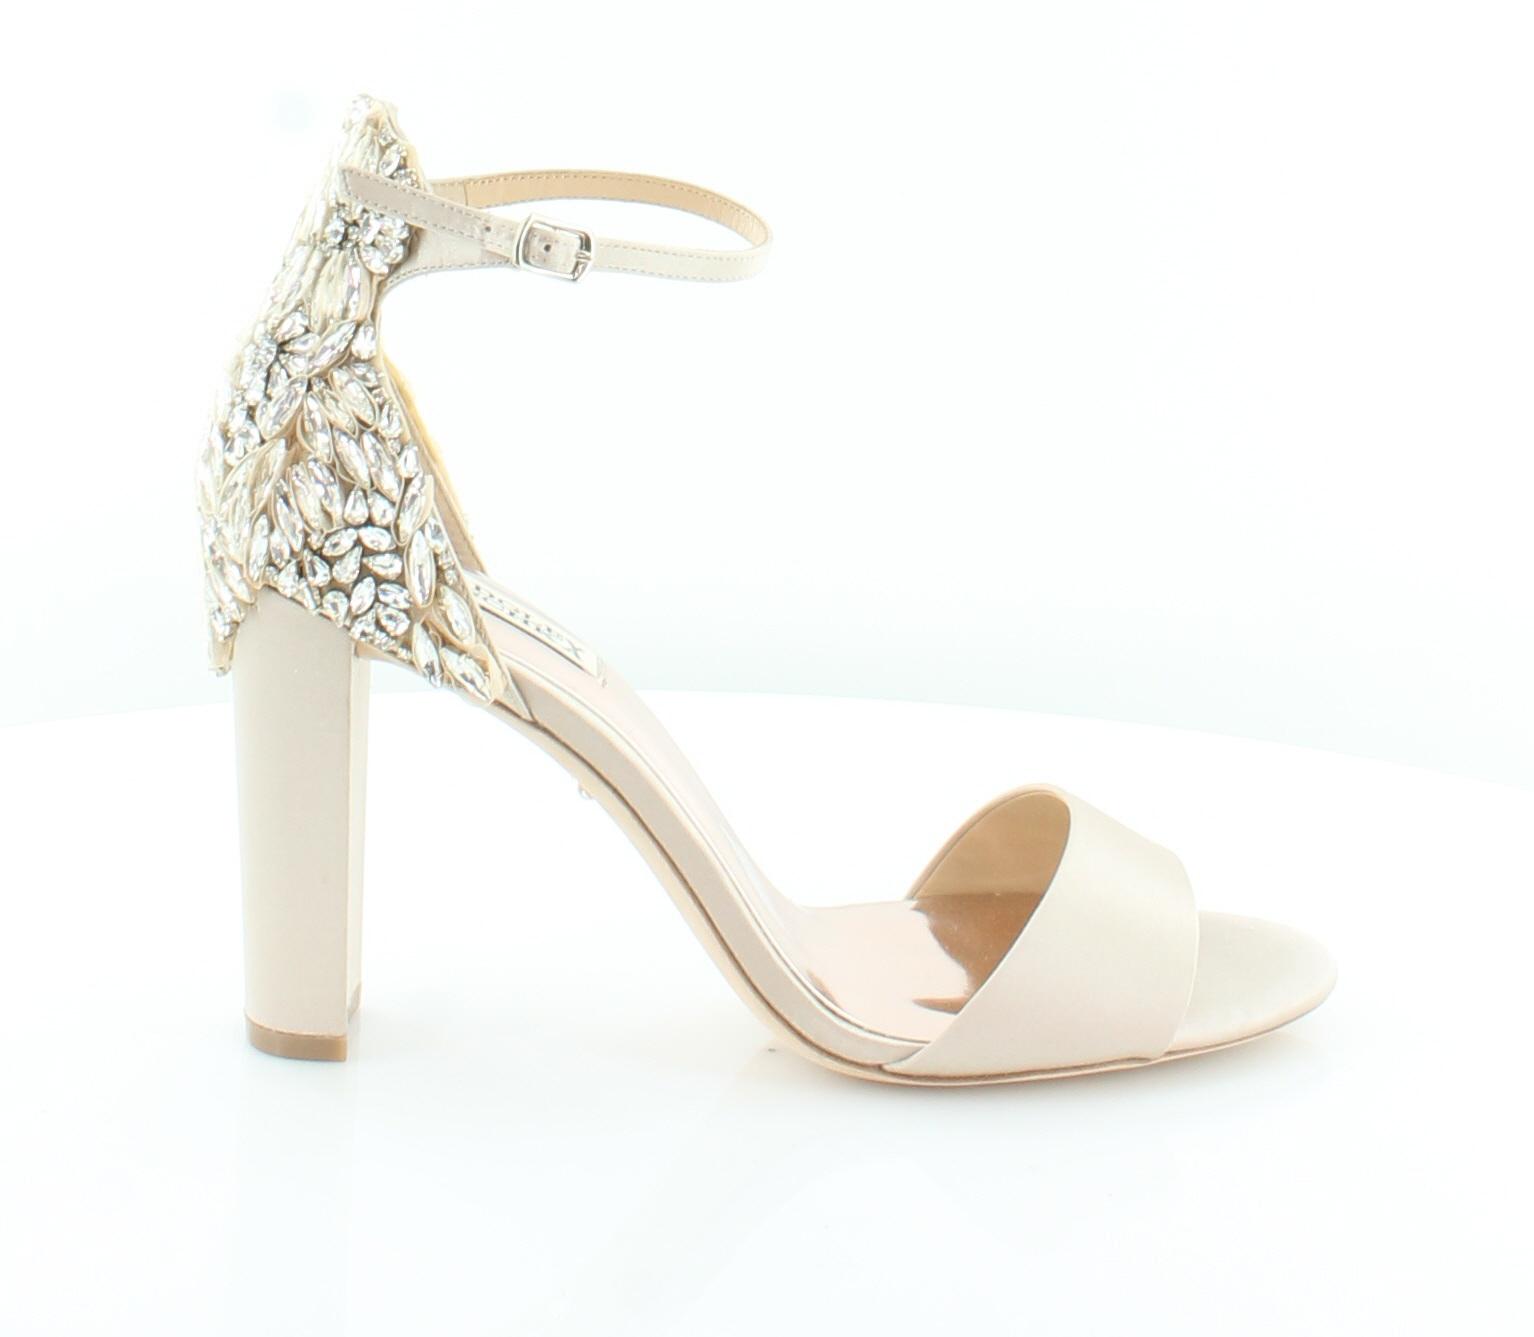 5744bf467c2 Badgley Mischka Seina Beige Womens Shoes Size 10 M Heels MSRP  275 ...